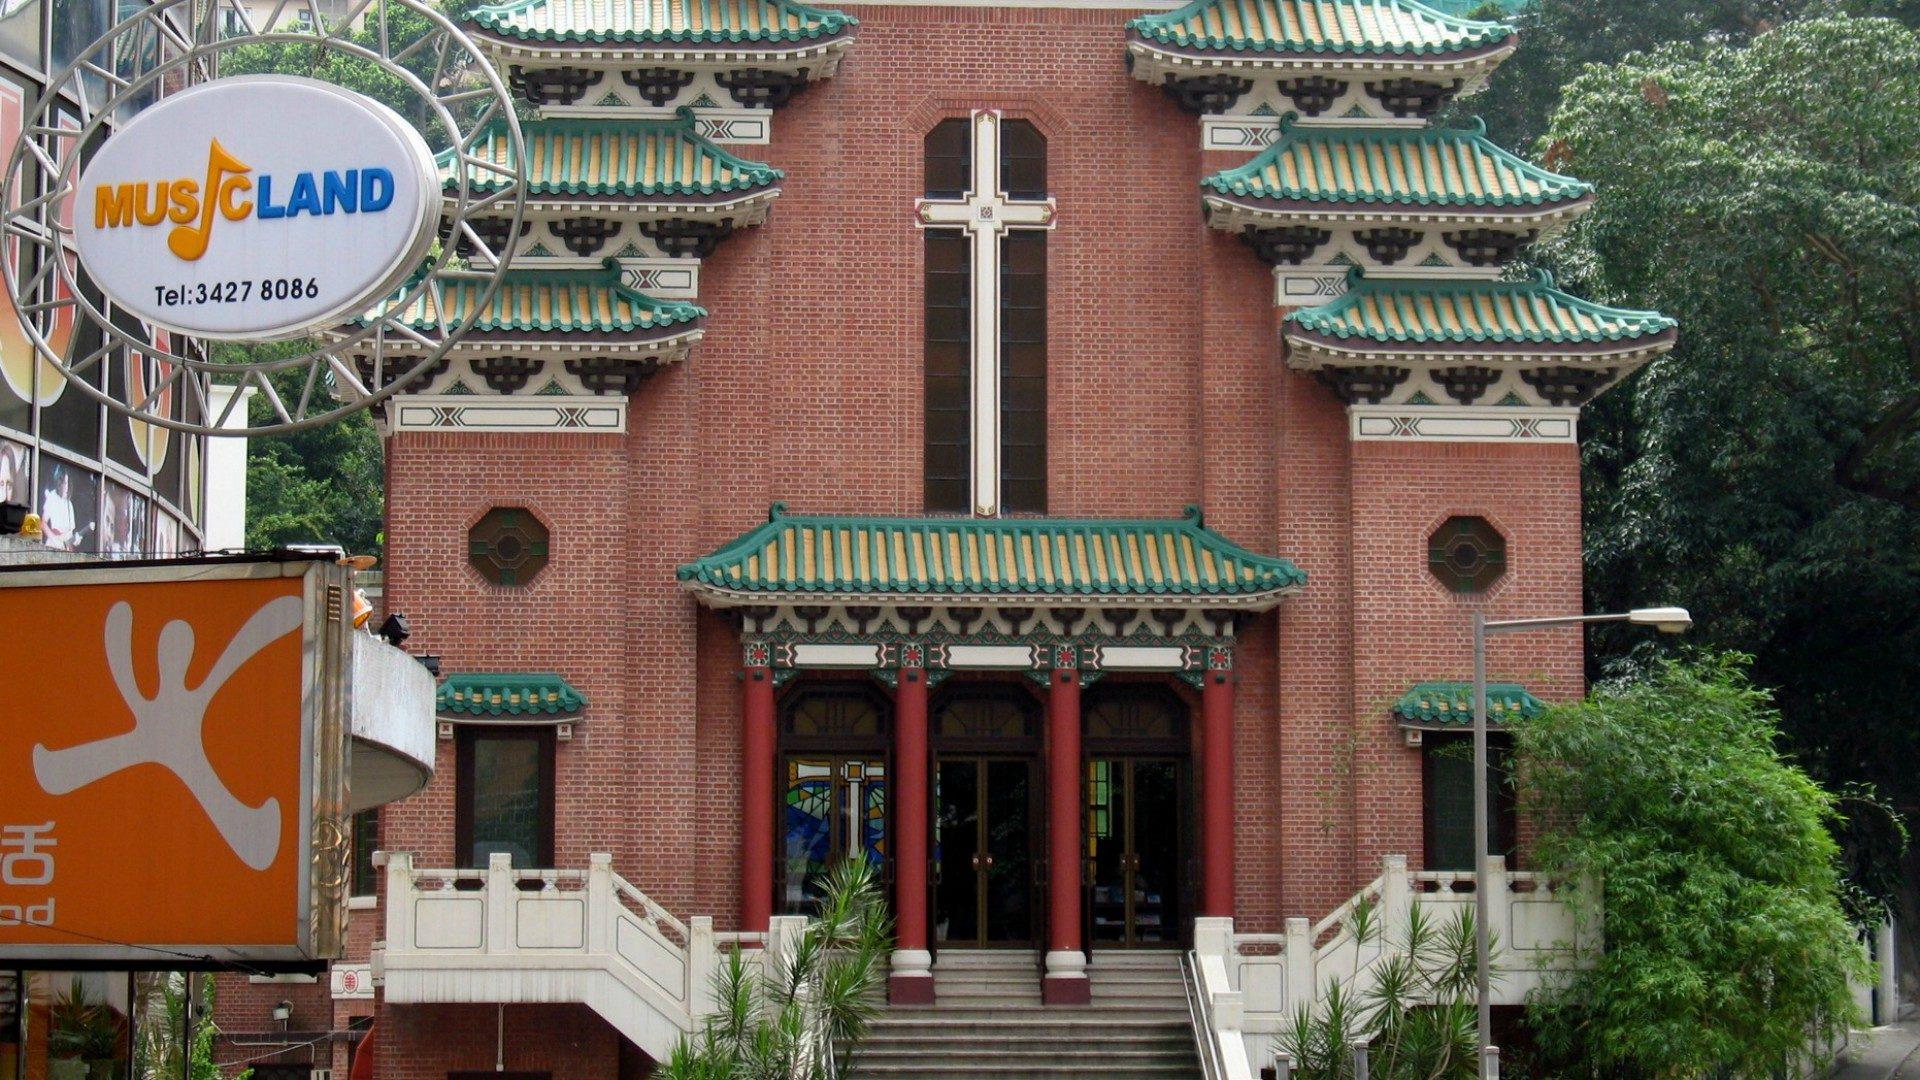 Hong Kong Christian rencontres en ligne Vitesse datation Carrollton GA